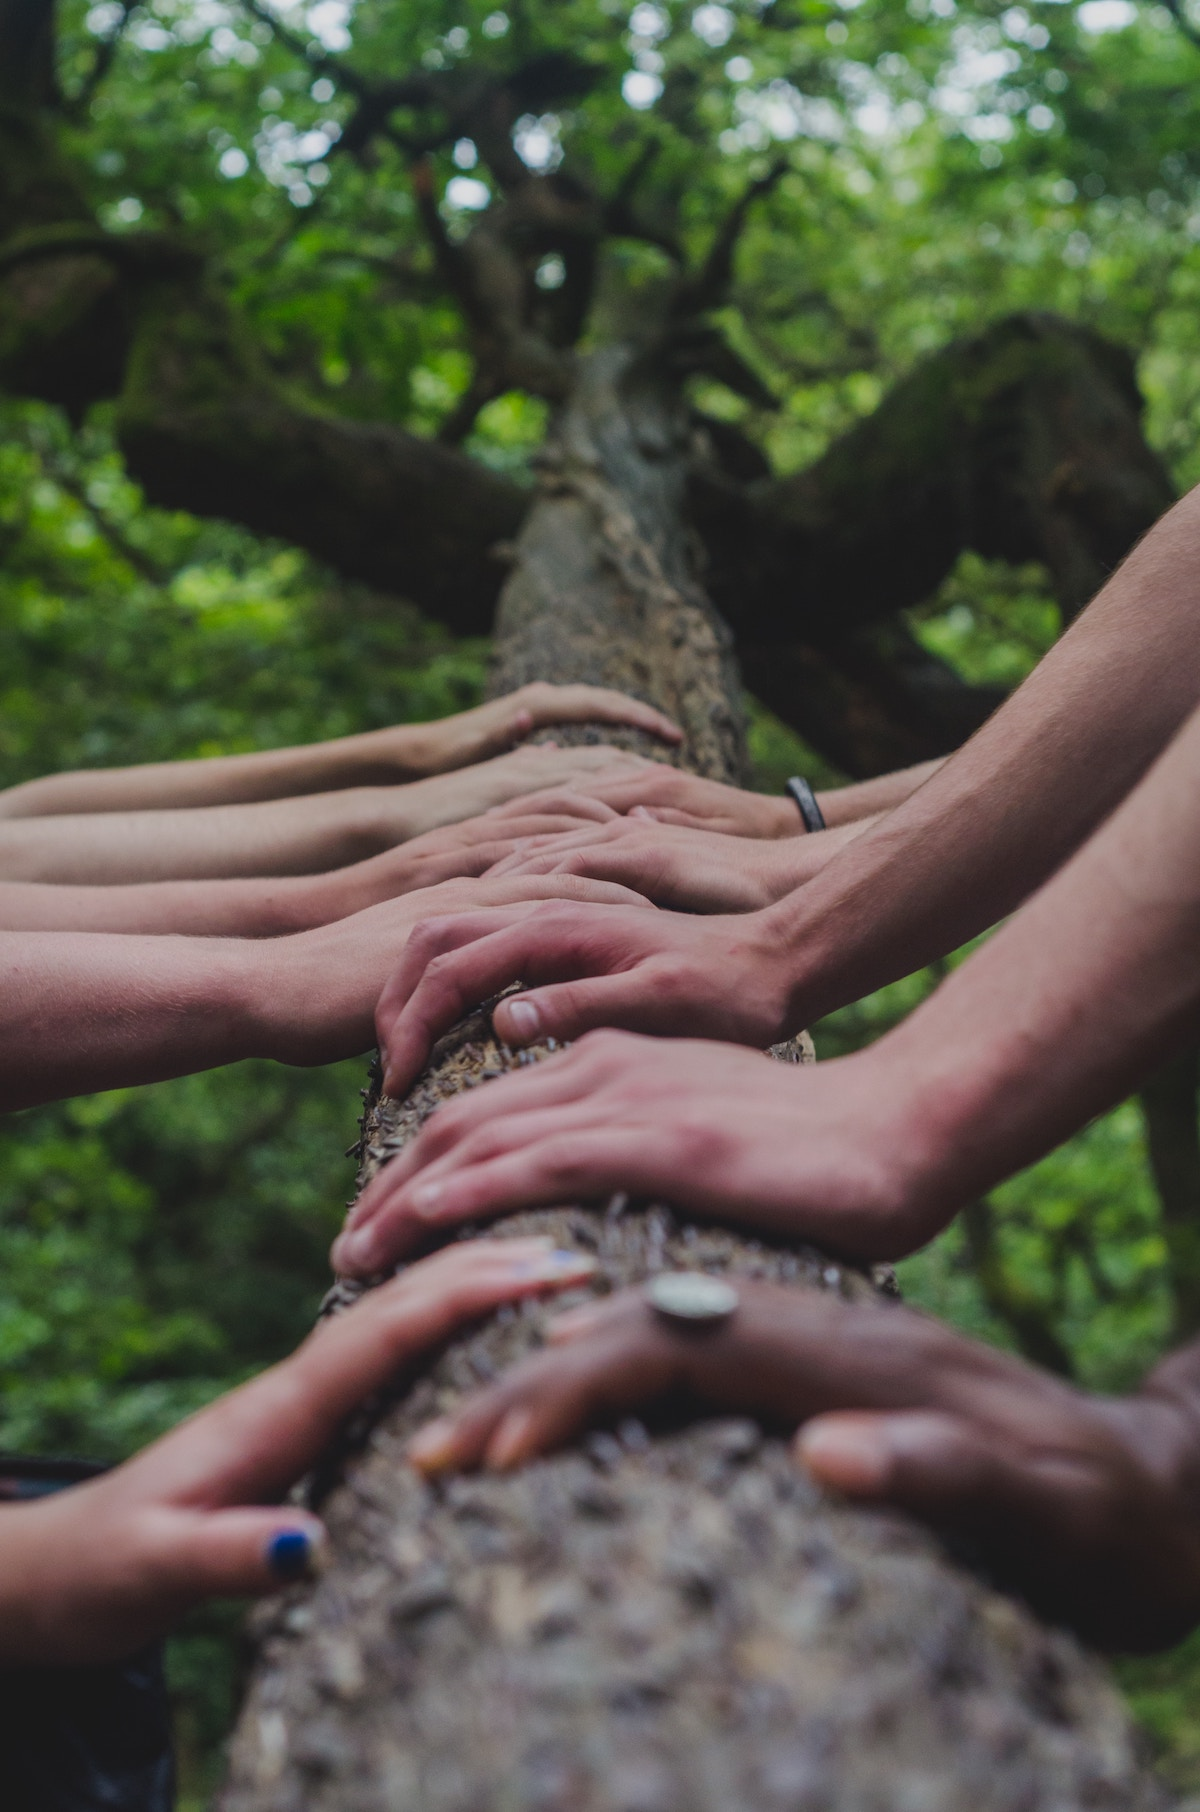 Enabling impact through the Social Impact Grants: closes 24 June